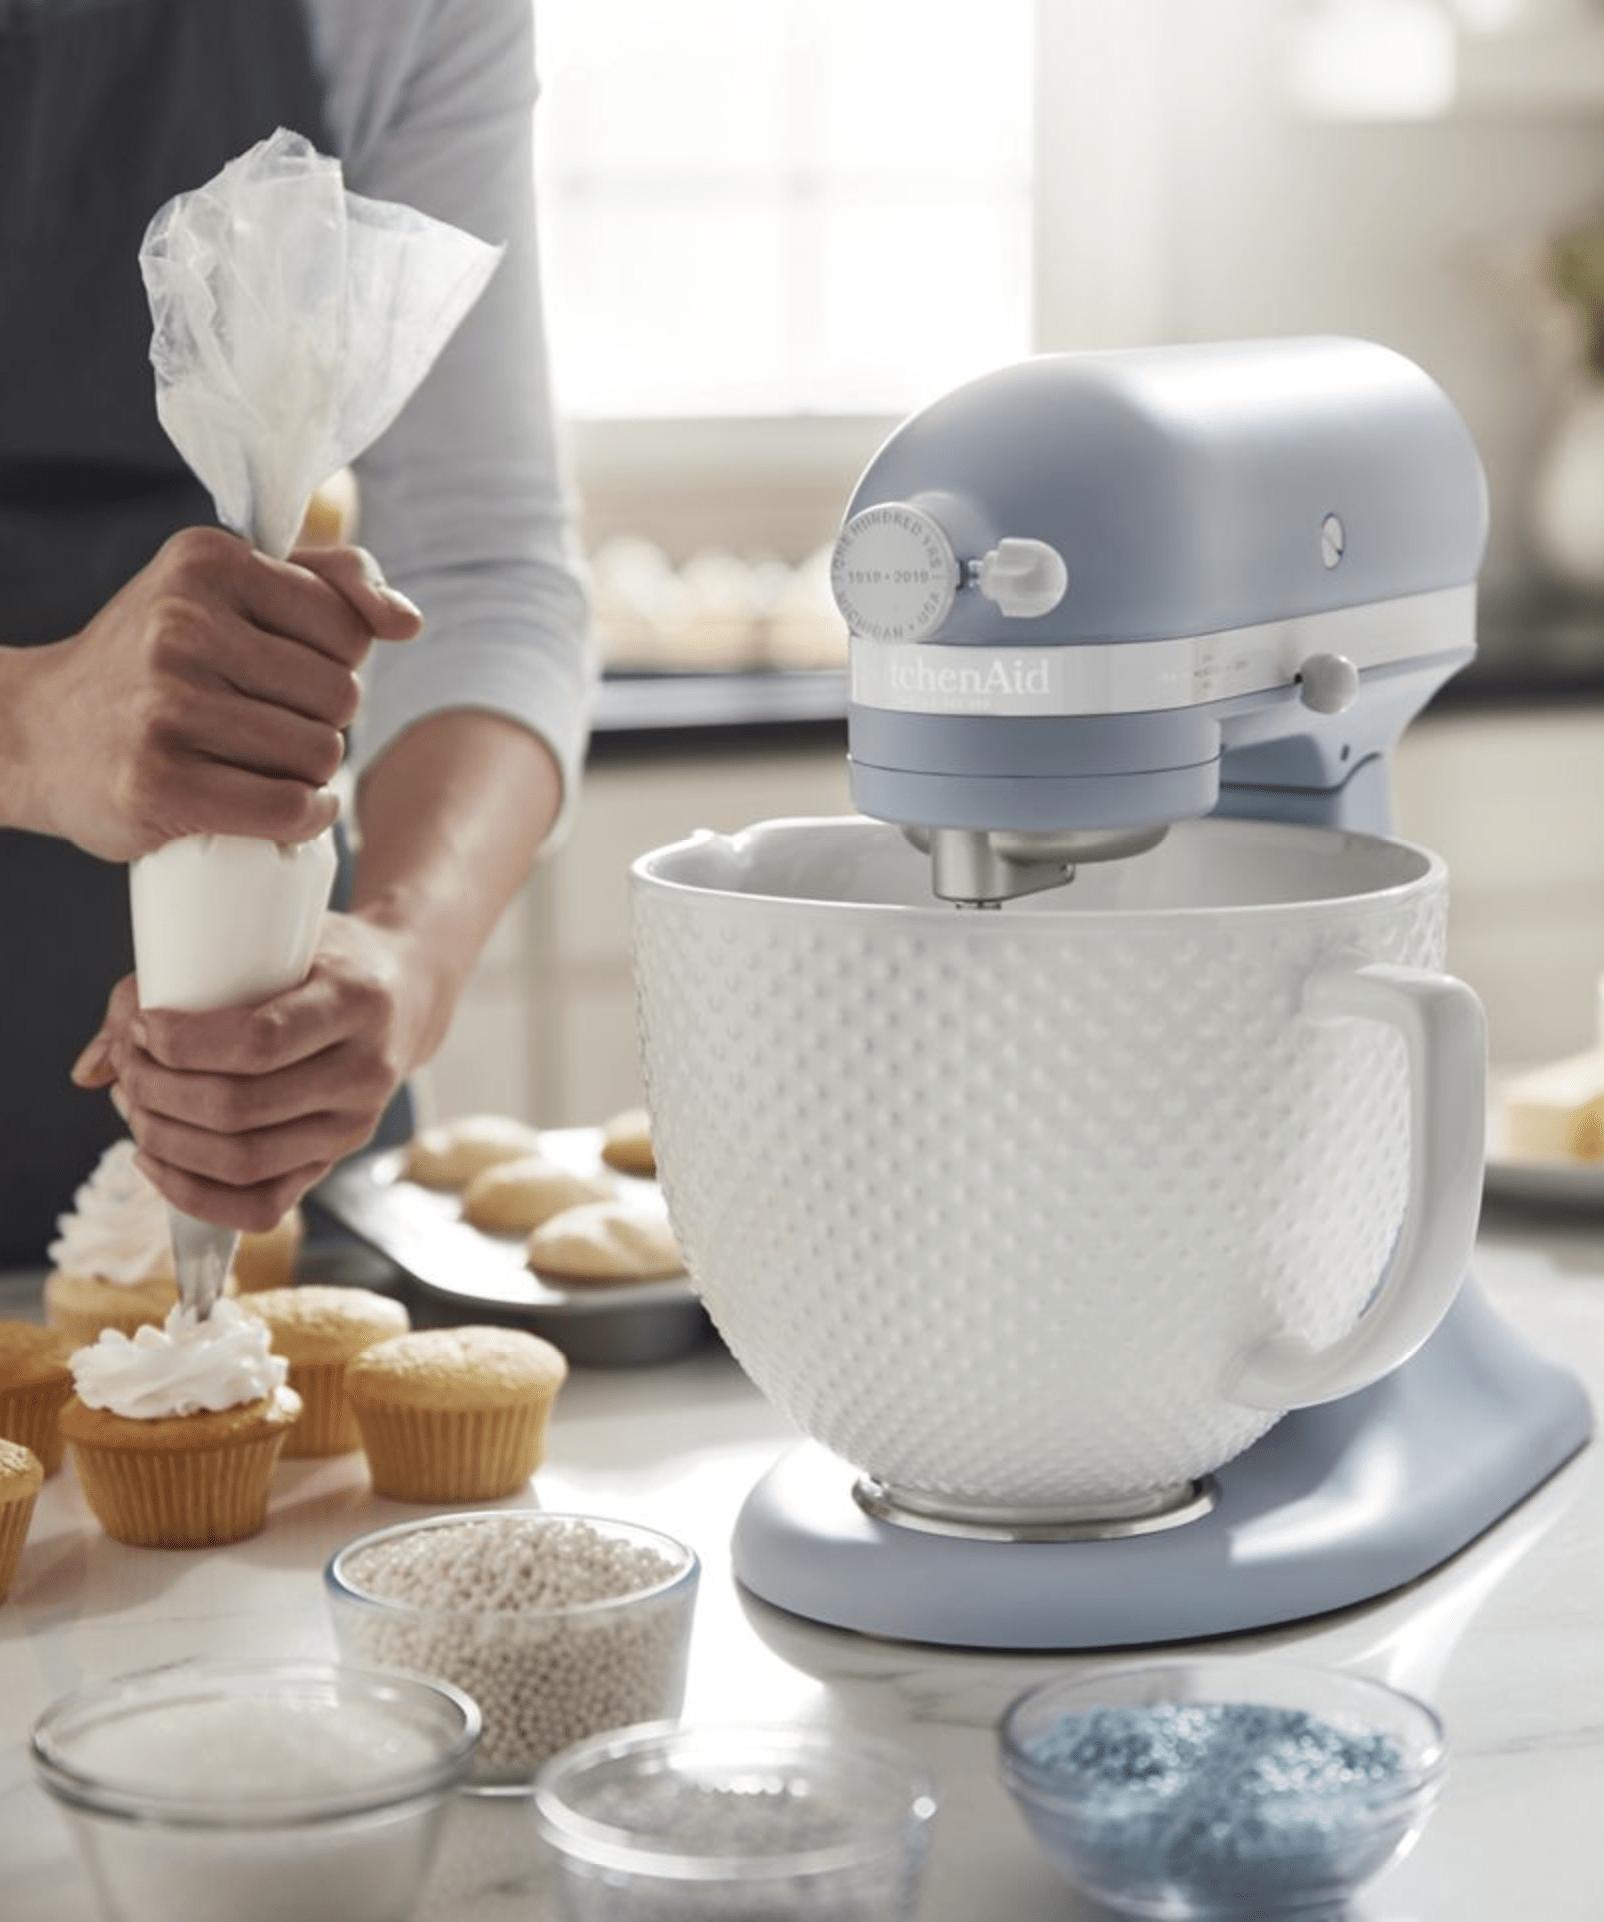 KitchenAid artisan mixer with hobnail bowl